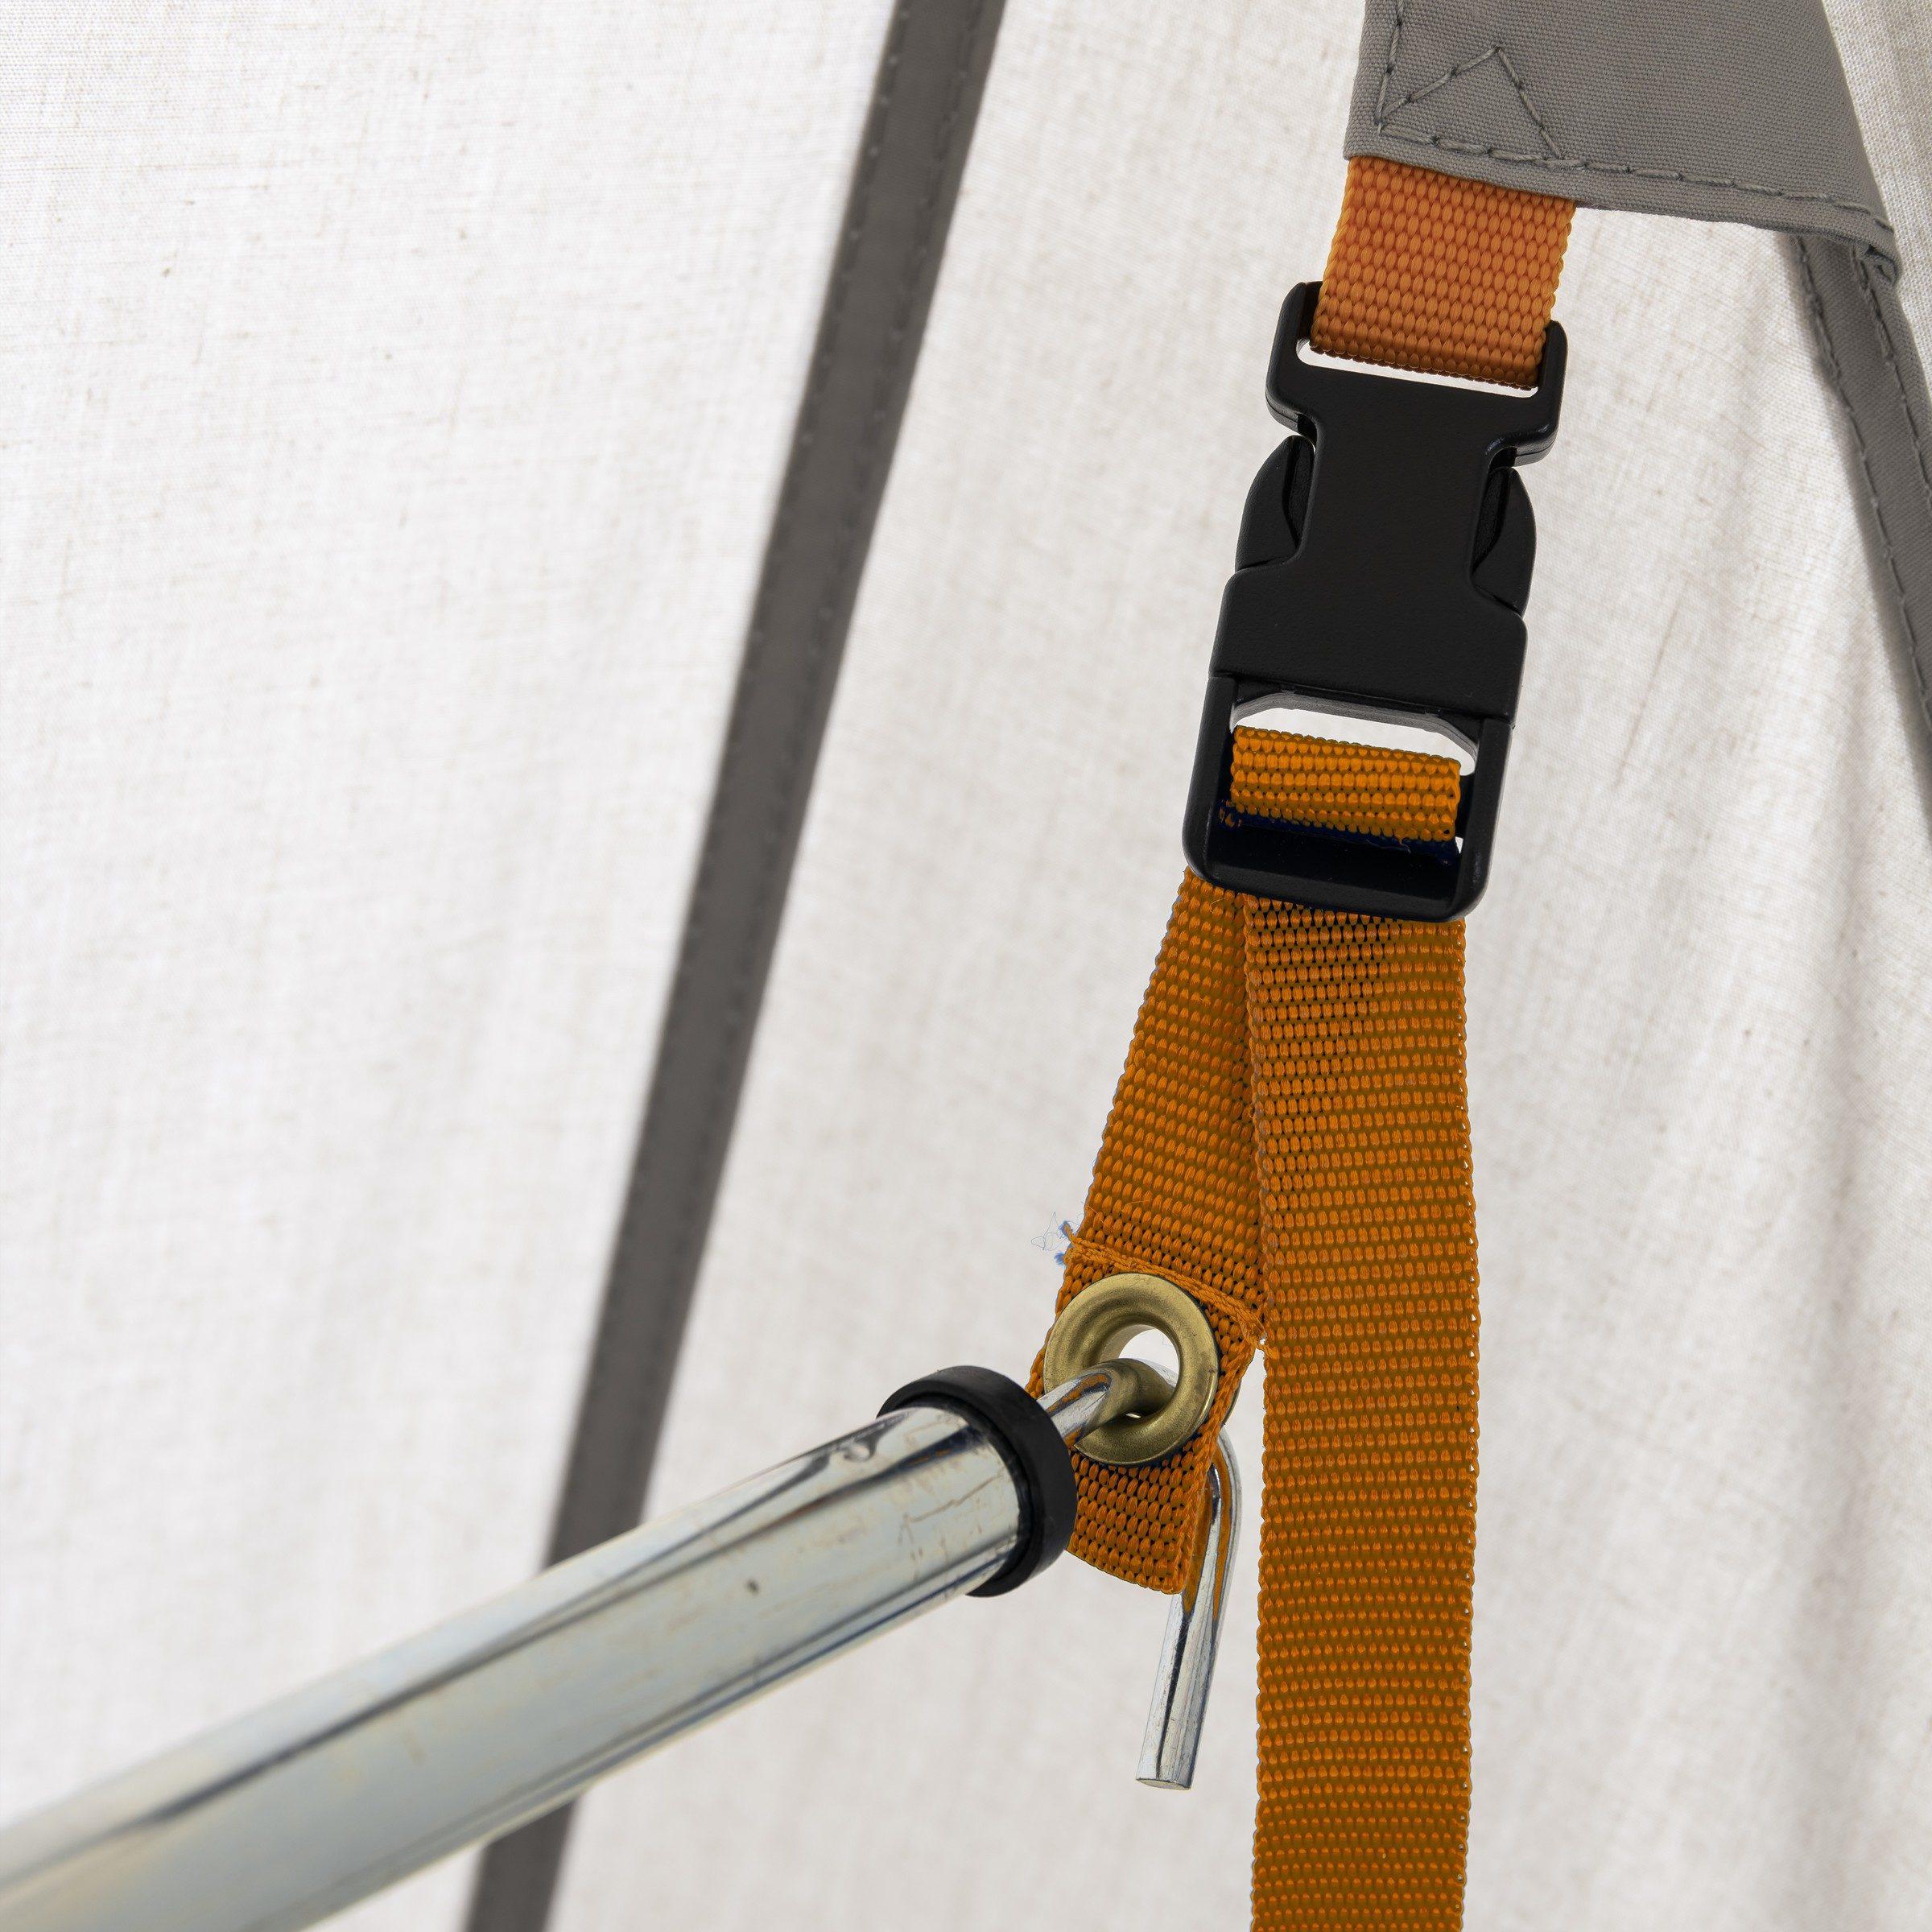 Kampa Dometic Wardrobe Pole